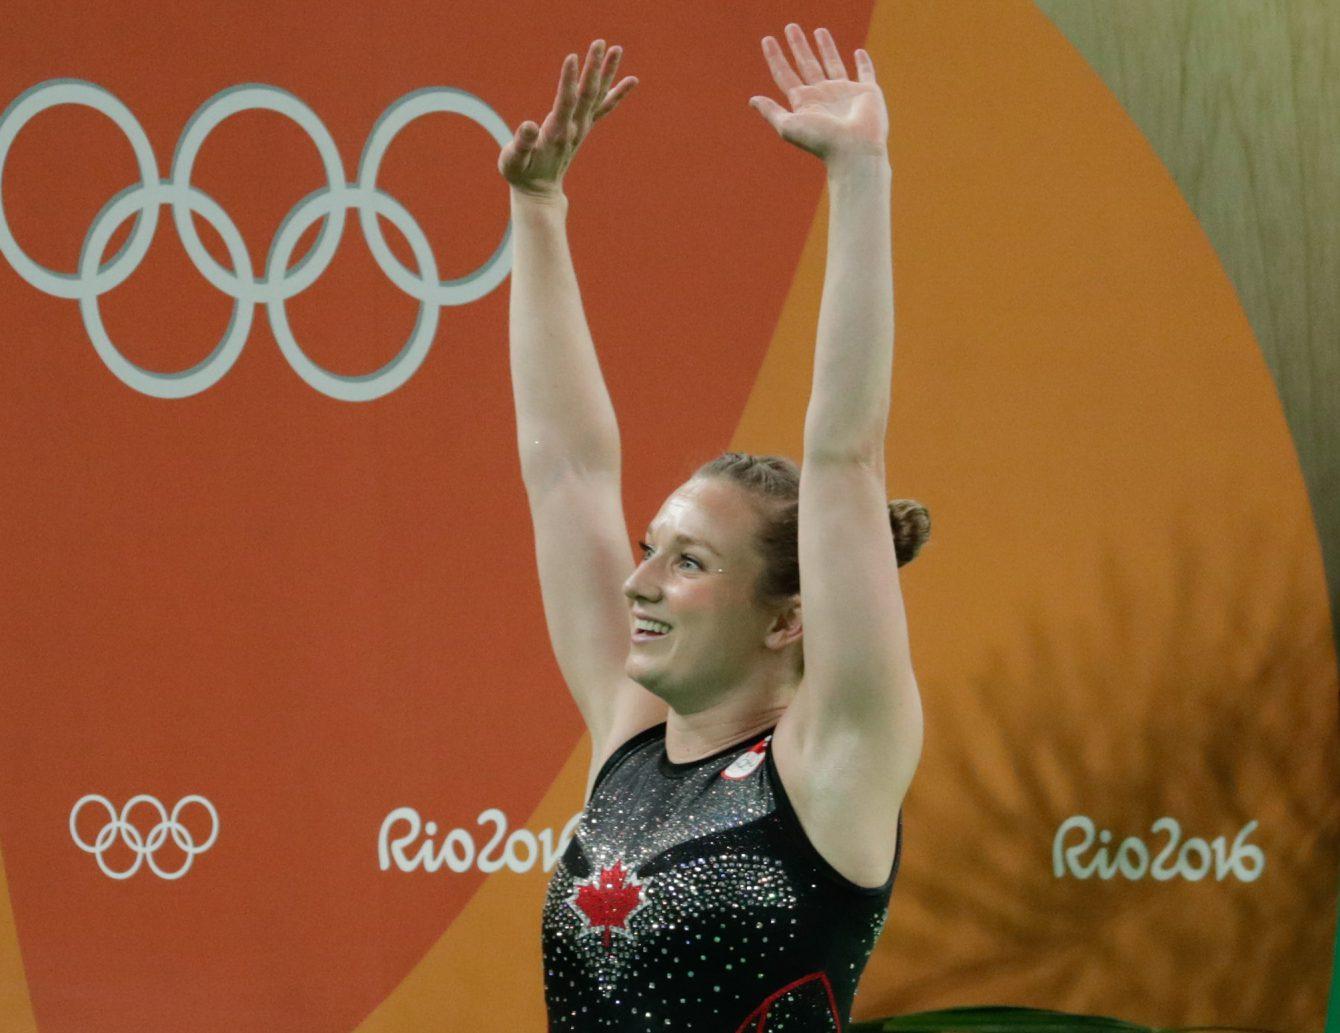 Rio 2016: MacLennan wins trampoline gold